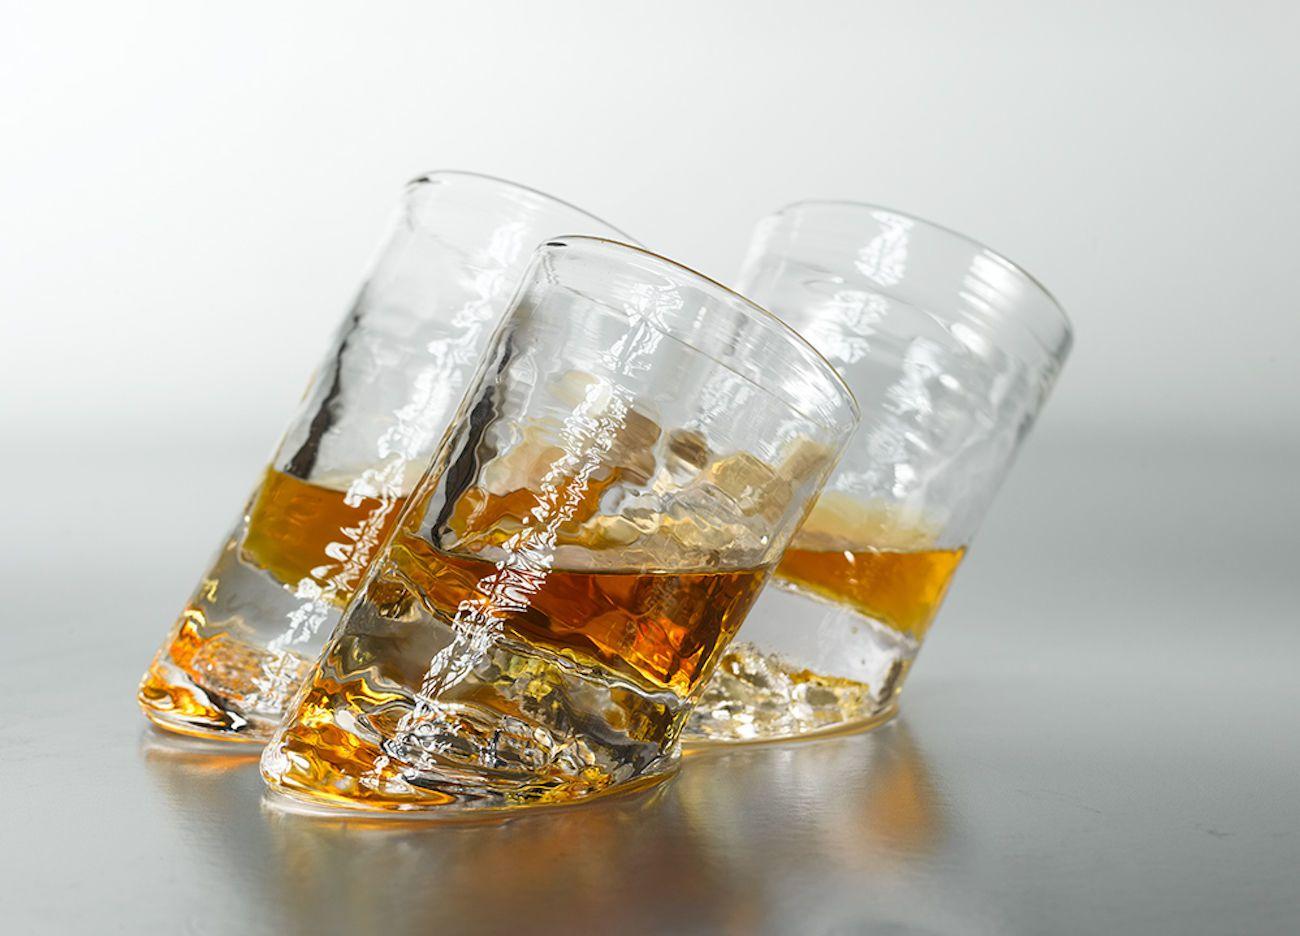 Glassblower Ben Slanted Bar Glasses hold more when held upright thumbnail